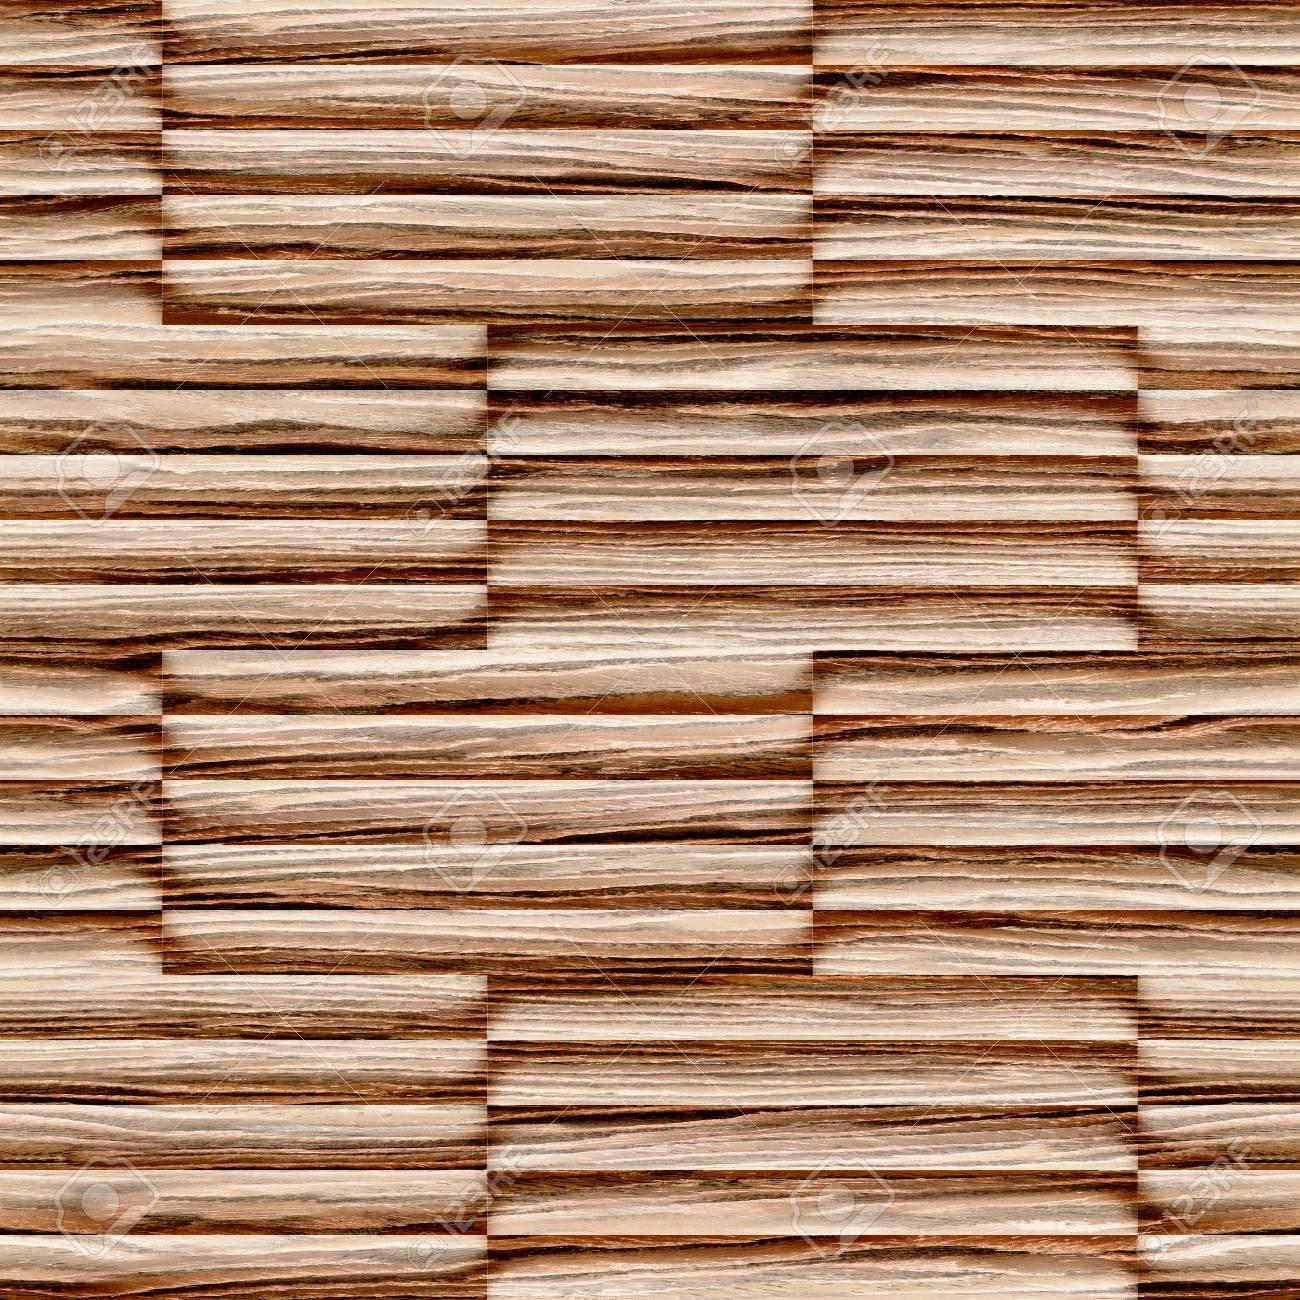 var man kan köpa nya specialerbjudanden enormt lager Abstract Wooden Paneling - Seamless Background - Blasted Oak ...